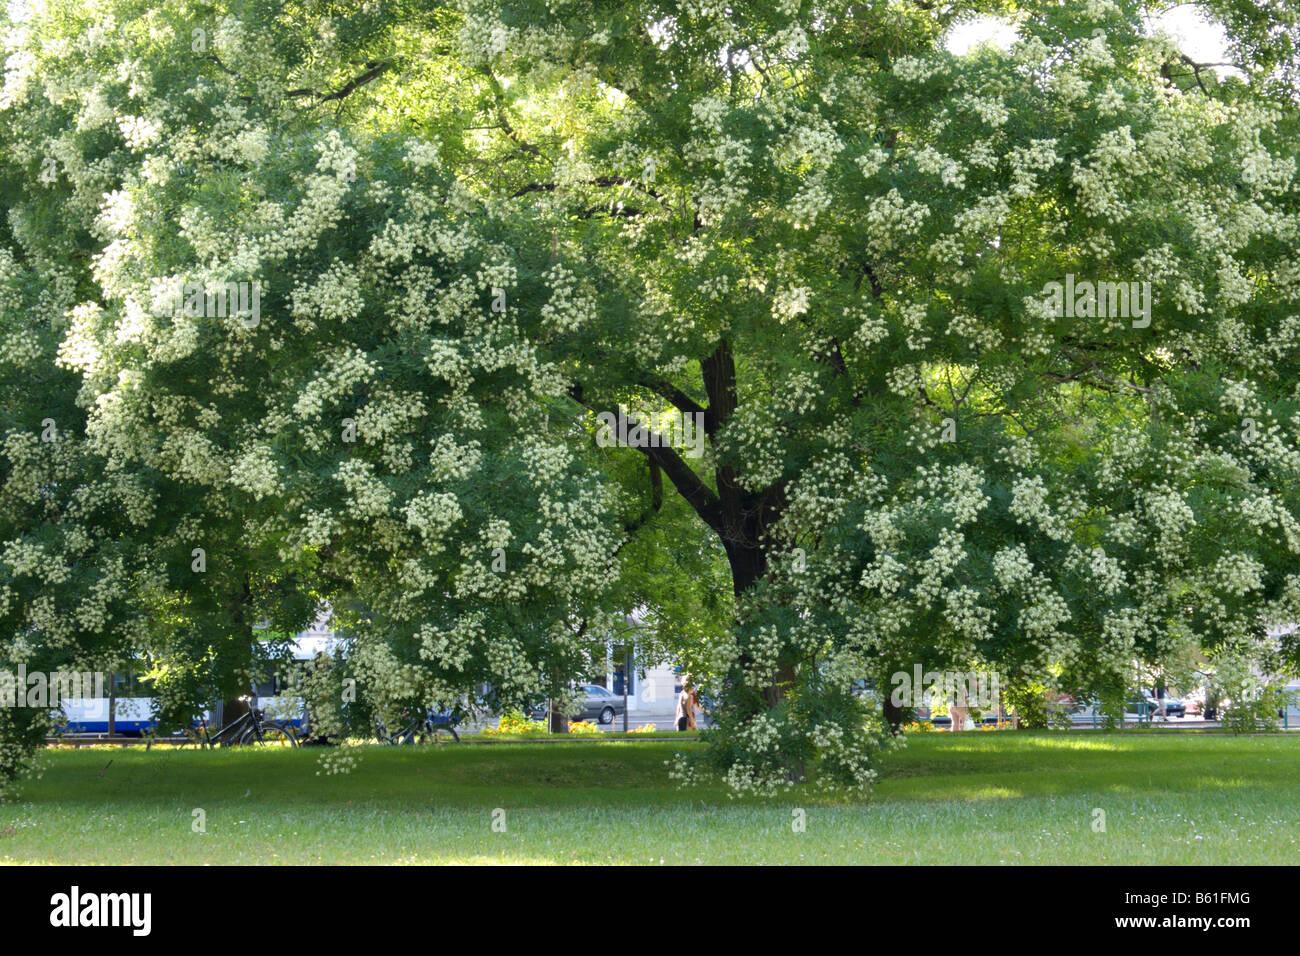 arbre pagode japonaise (styphnolobium japonicum syn. sophora